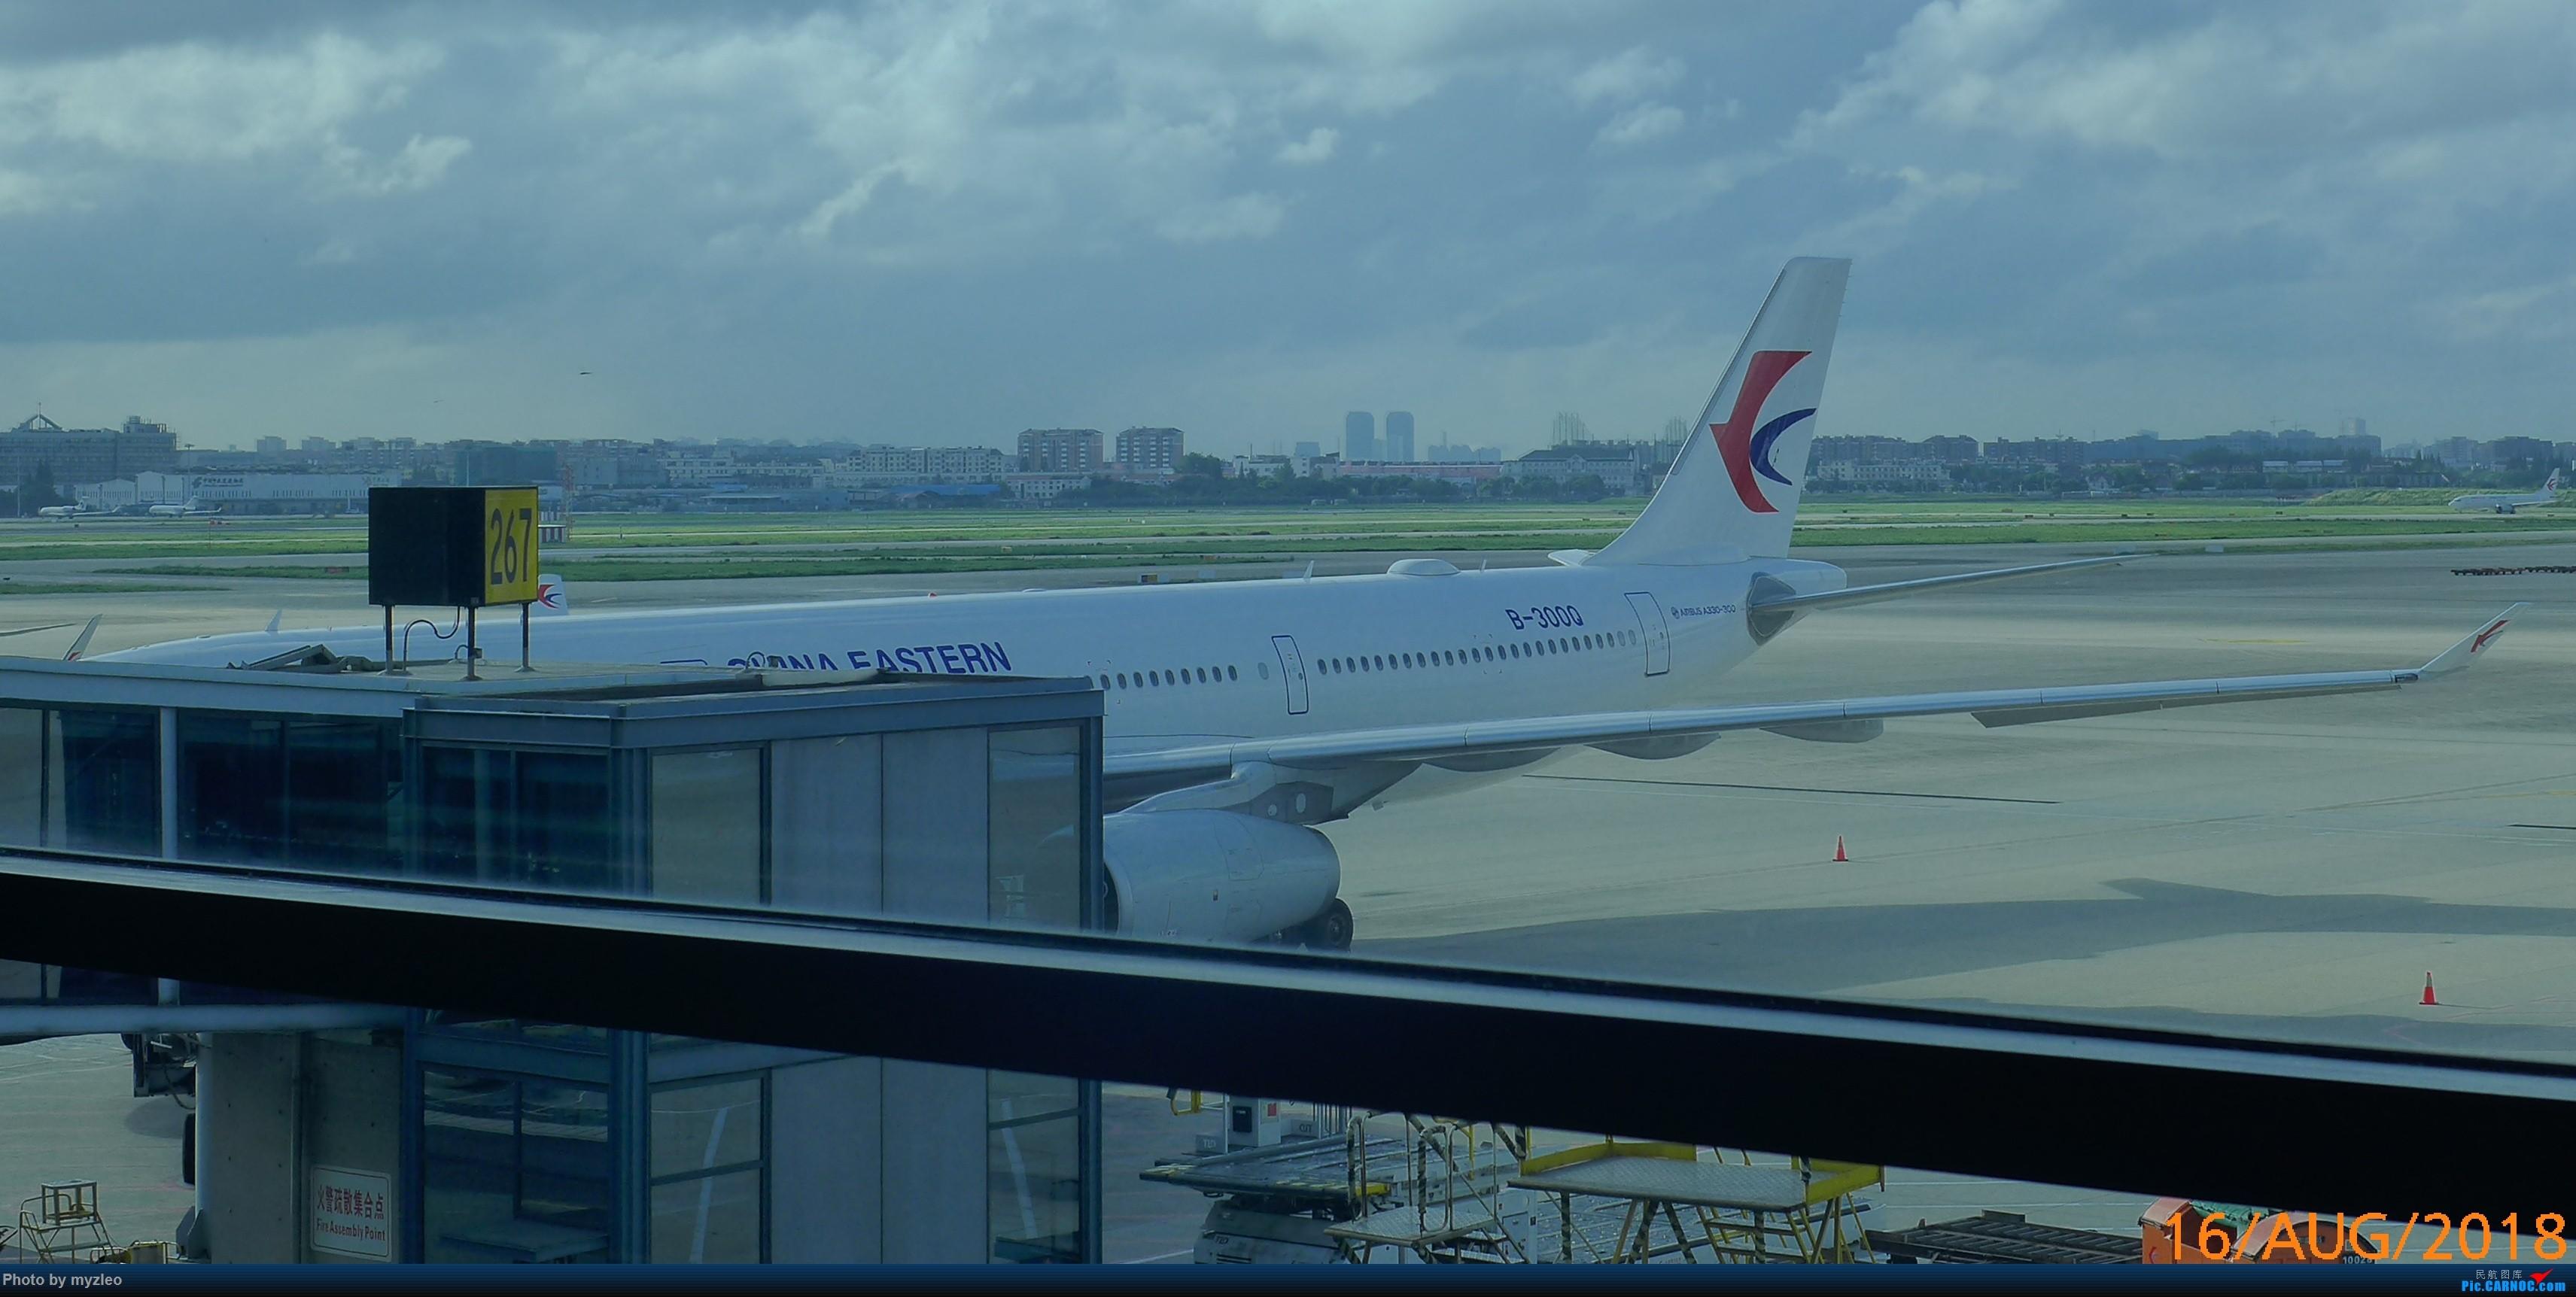 Re:[原创]【myzleo的游记3.1】三访帝都——记一次意外的惊喜,大鹅头初遇,第一次去中关村 AIRBUS A330-300 B-300Q 中国上海虹桥国际机场